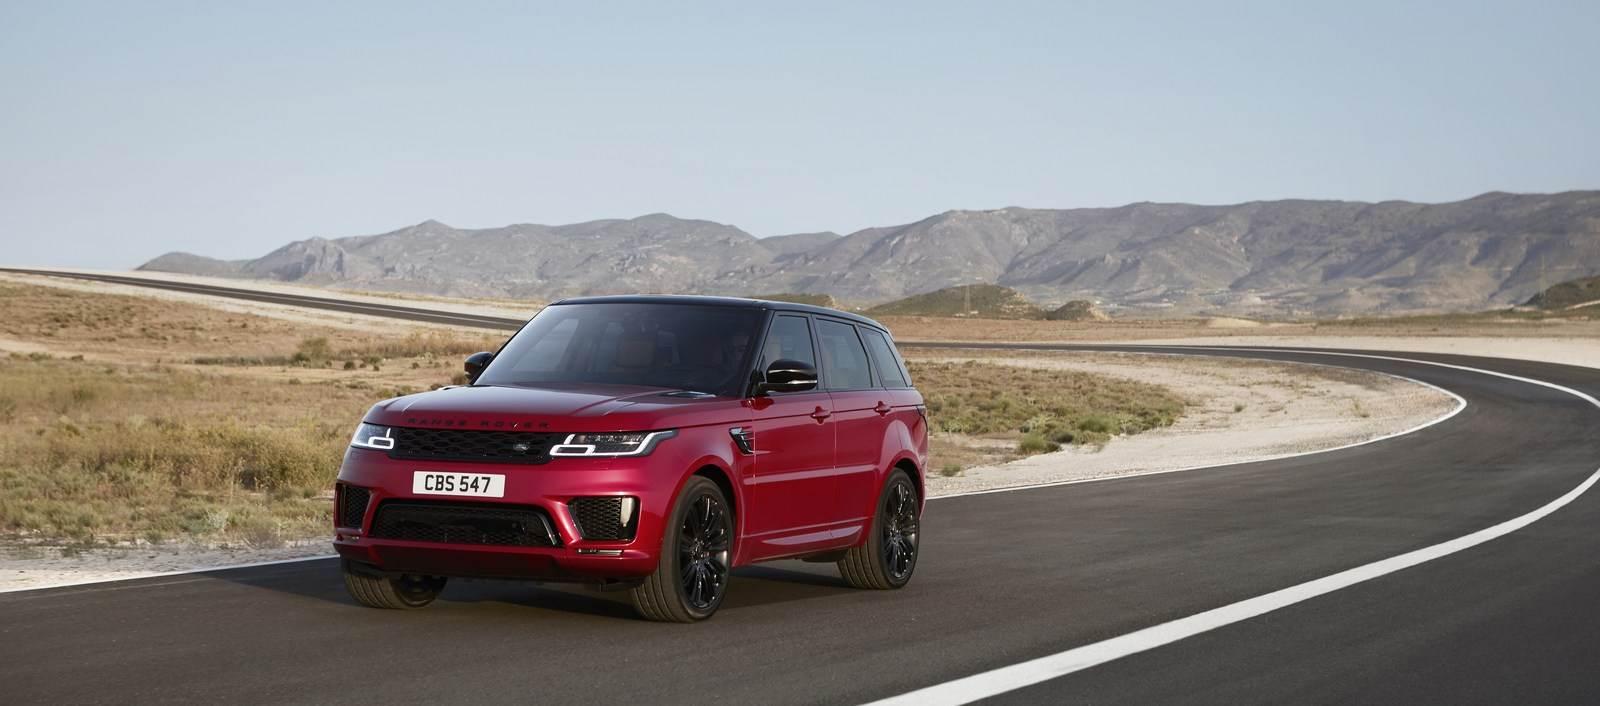 2018 Range Rover Sport facelift image gallery